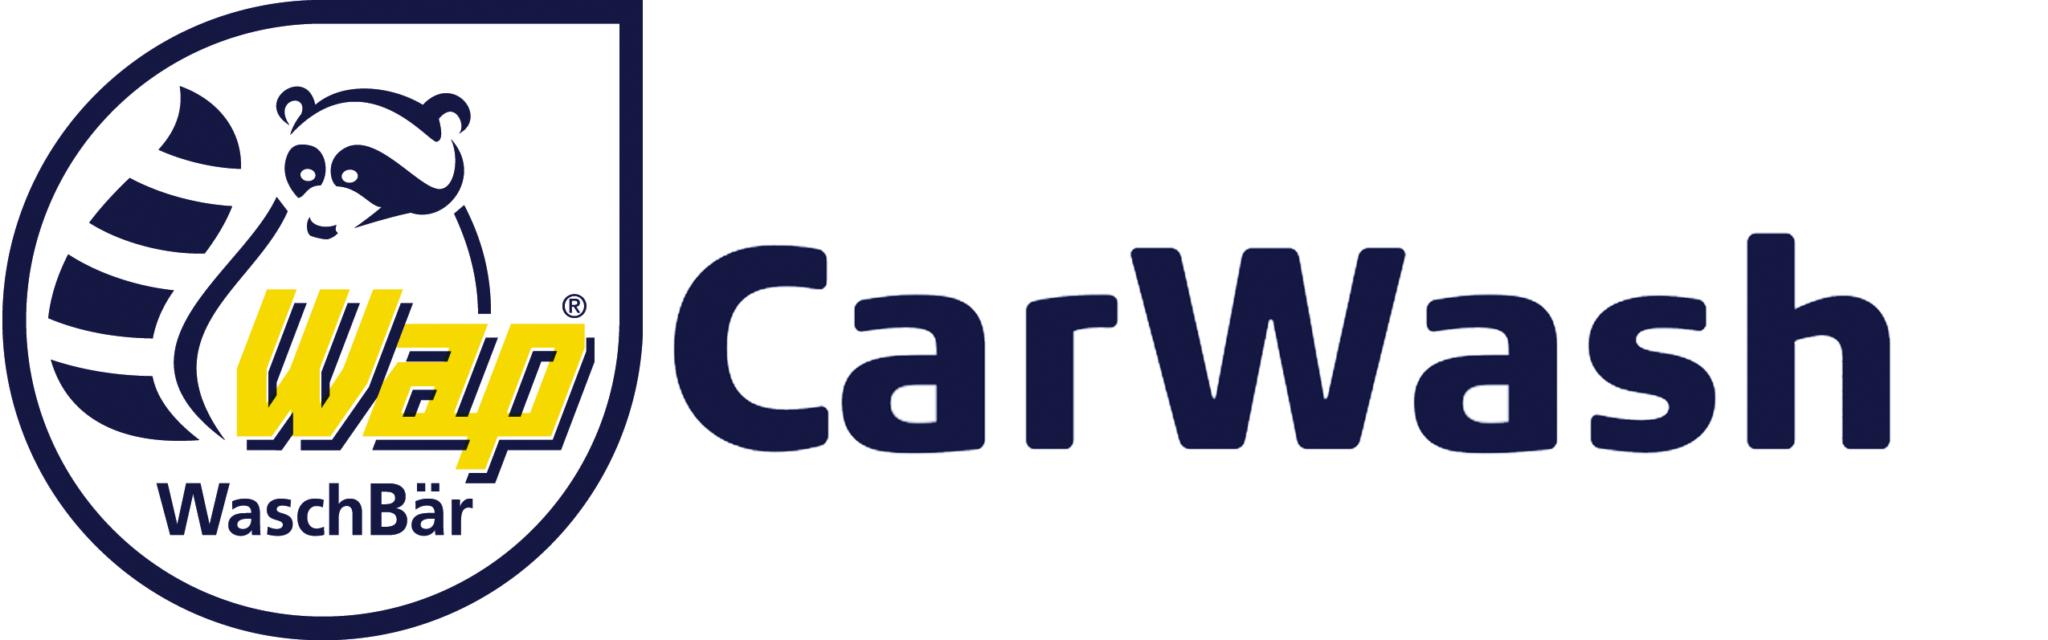 Tunnel Carwash